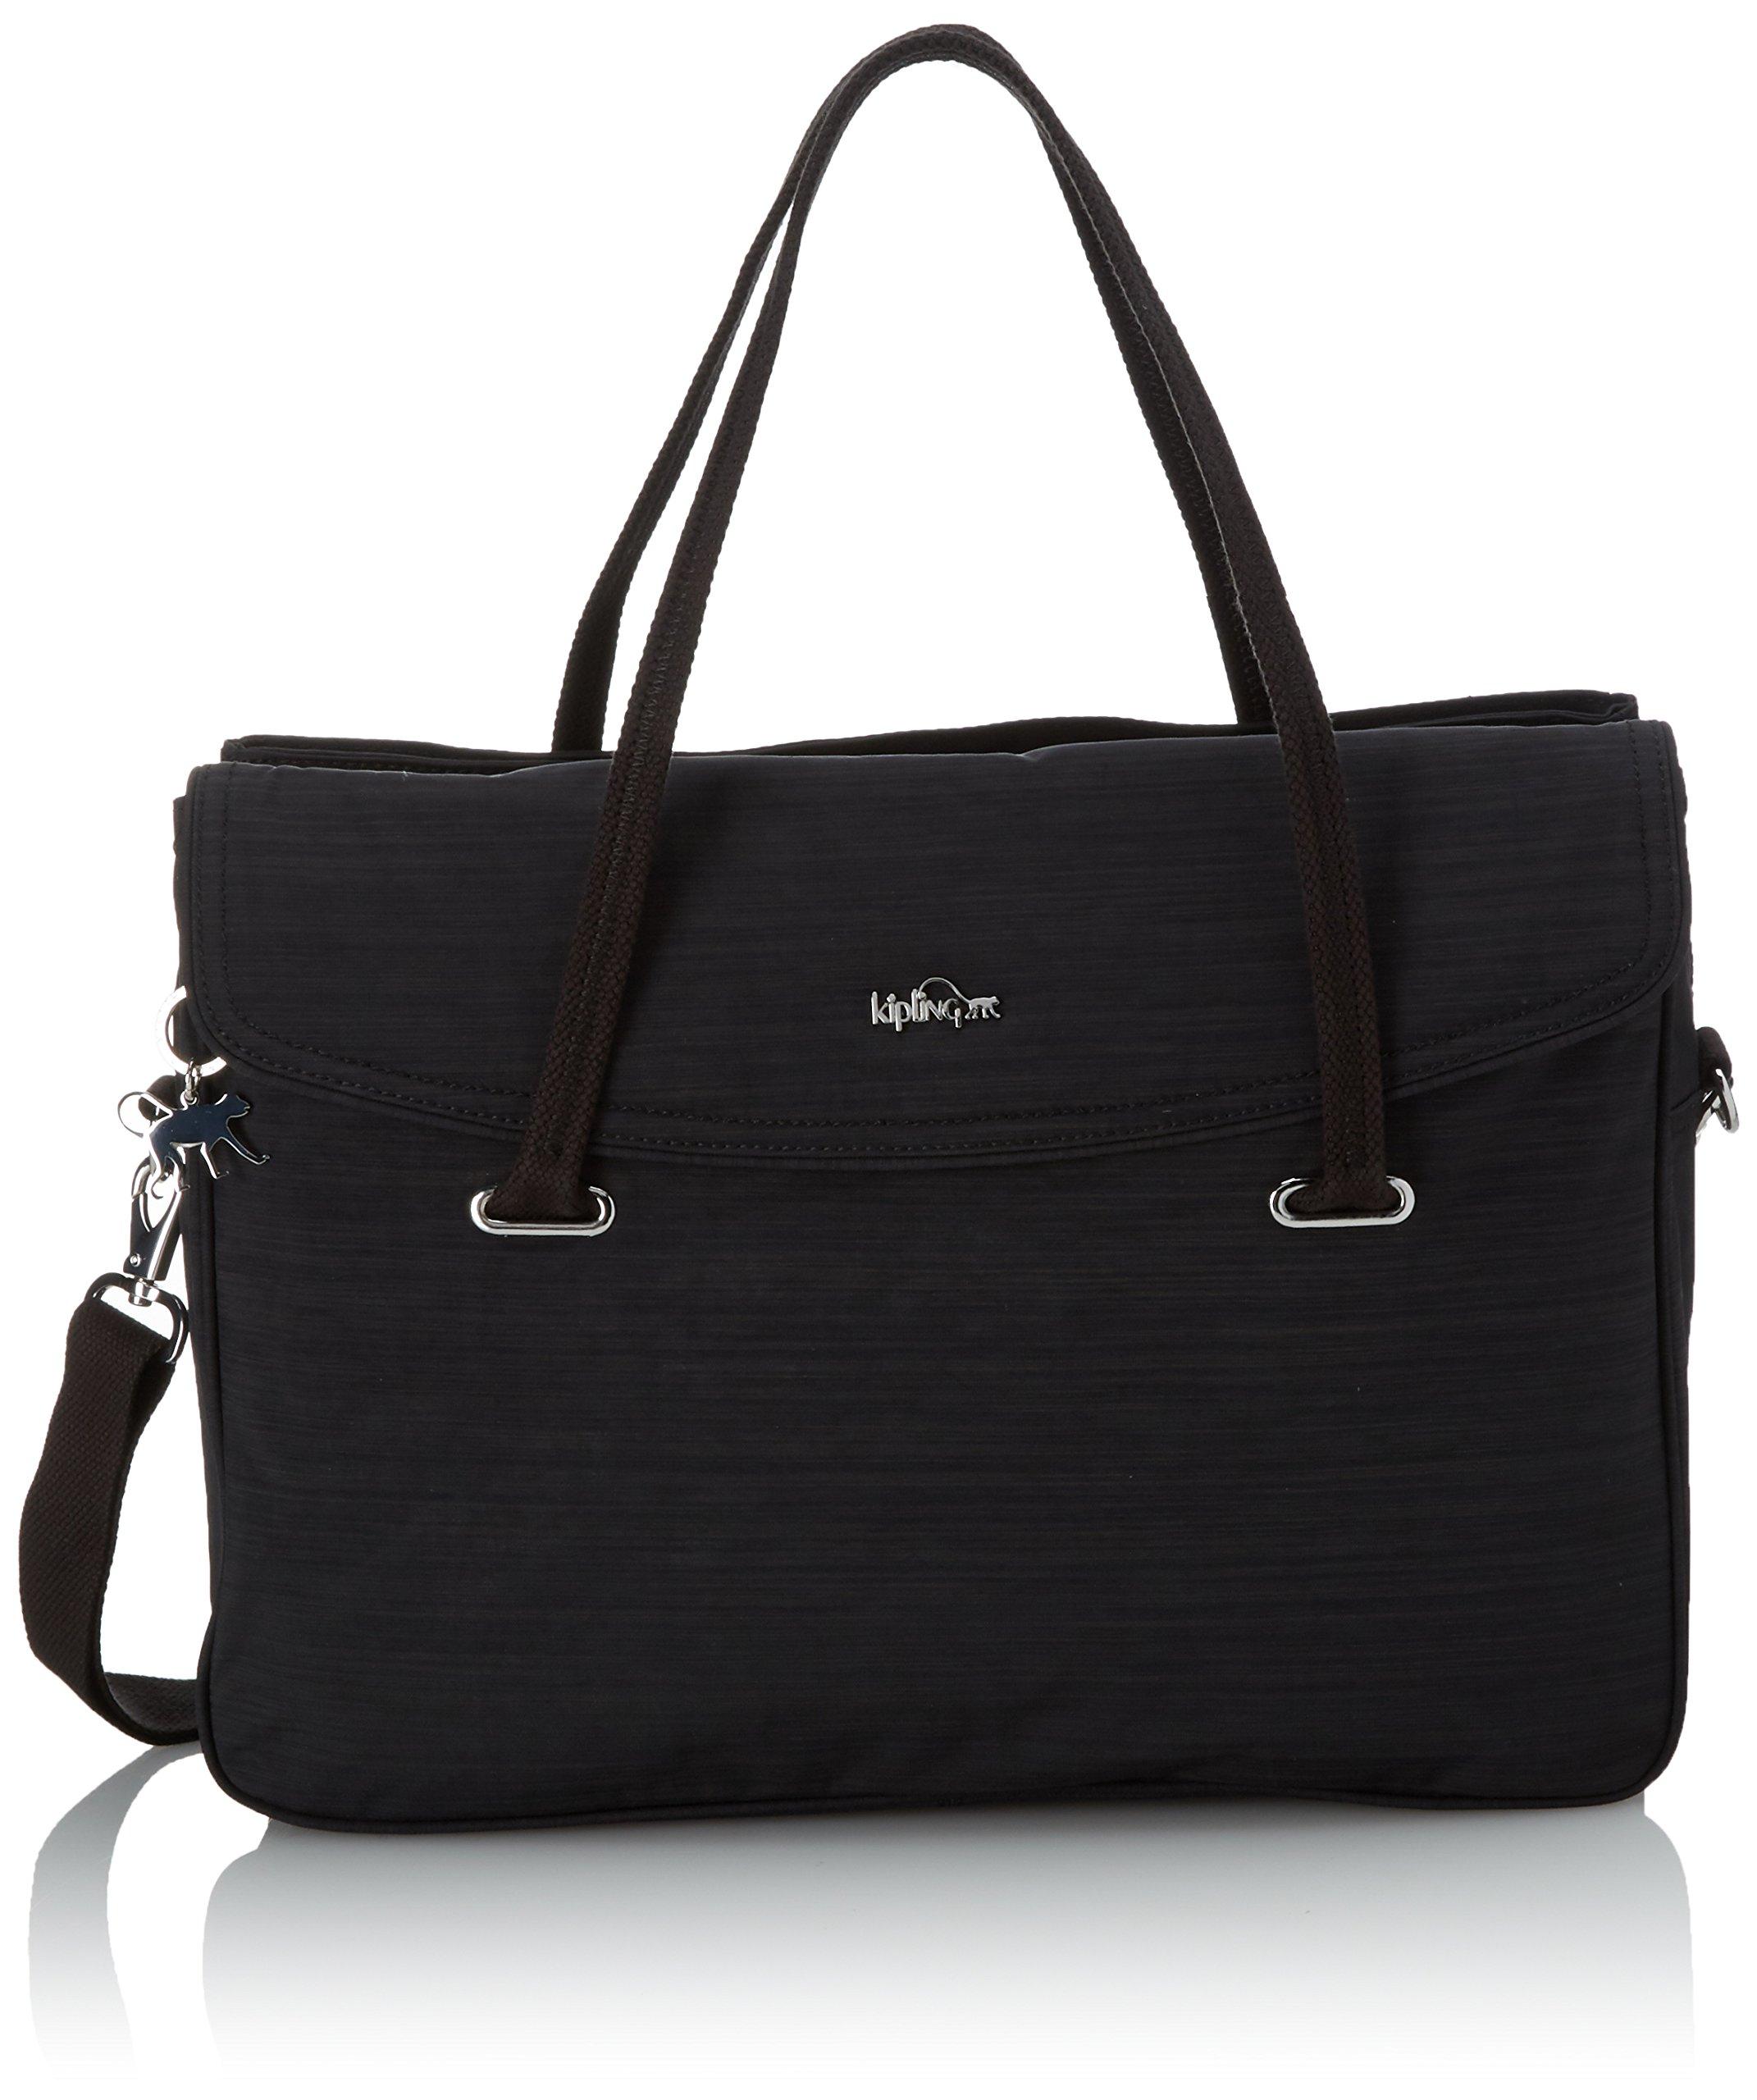 Kipling Superwork Working Bag Dazz Black